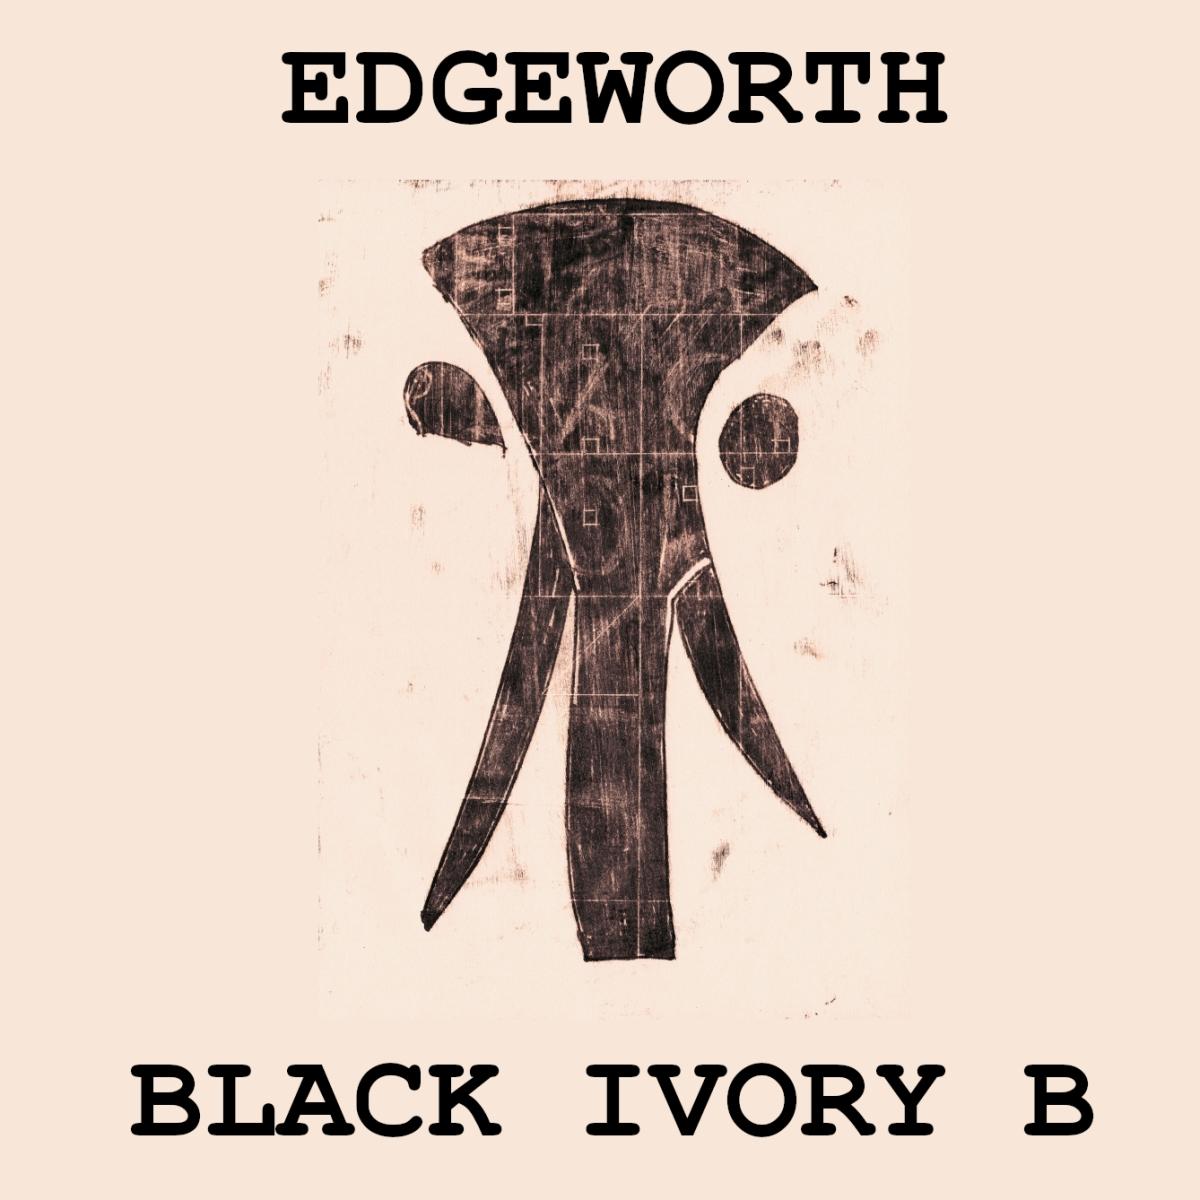 Black Ivory B